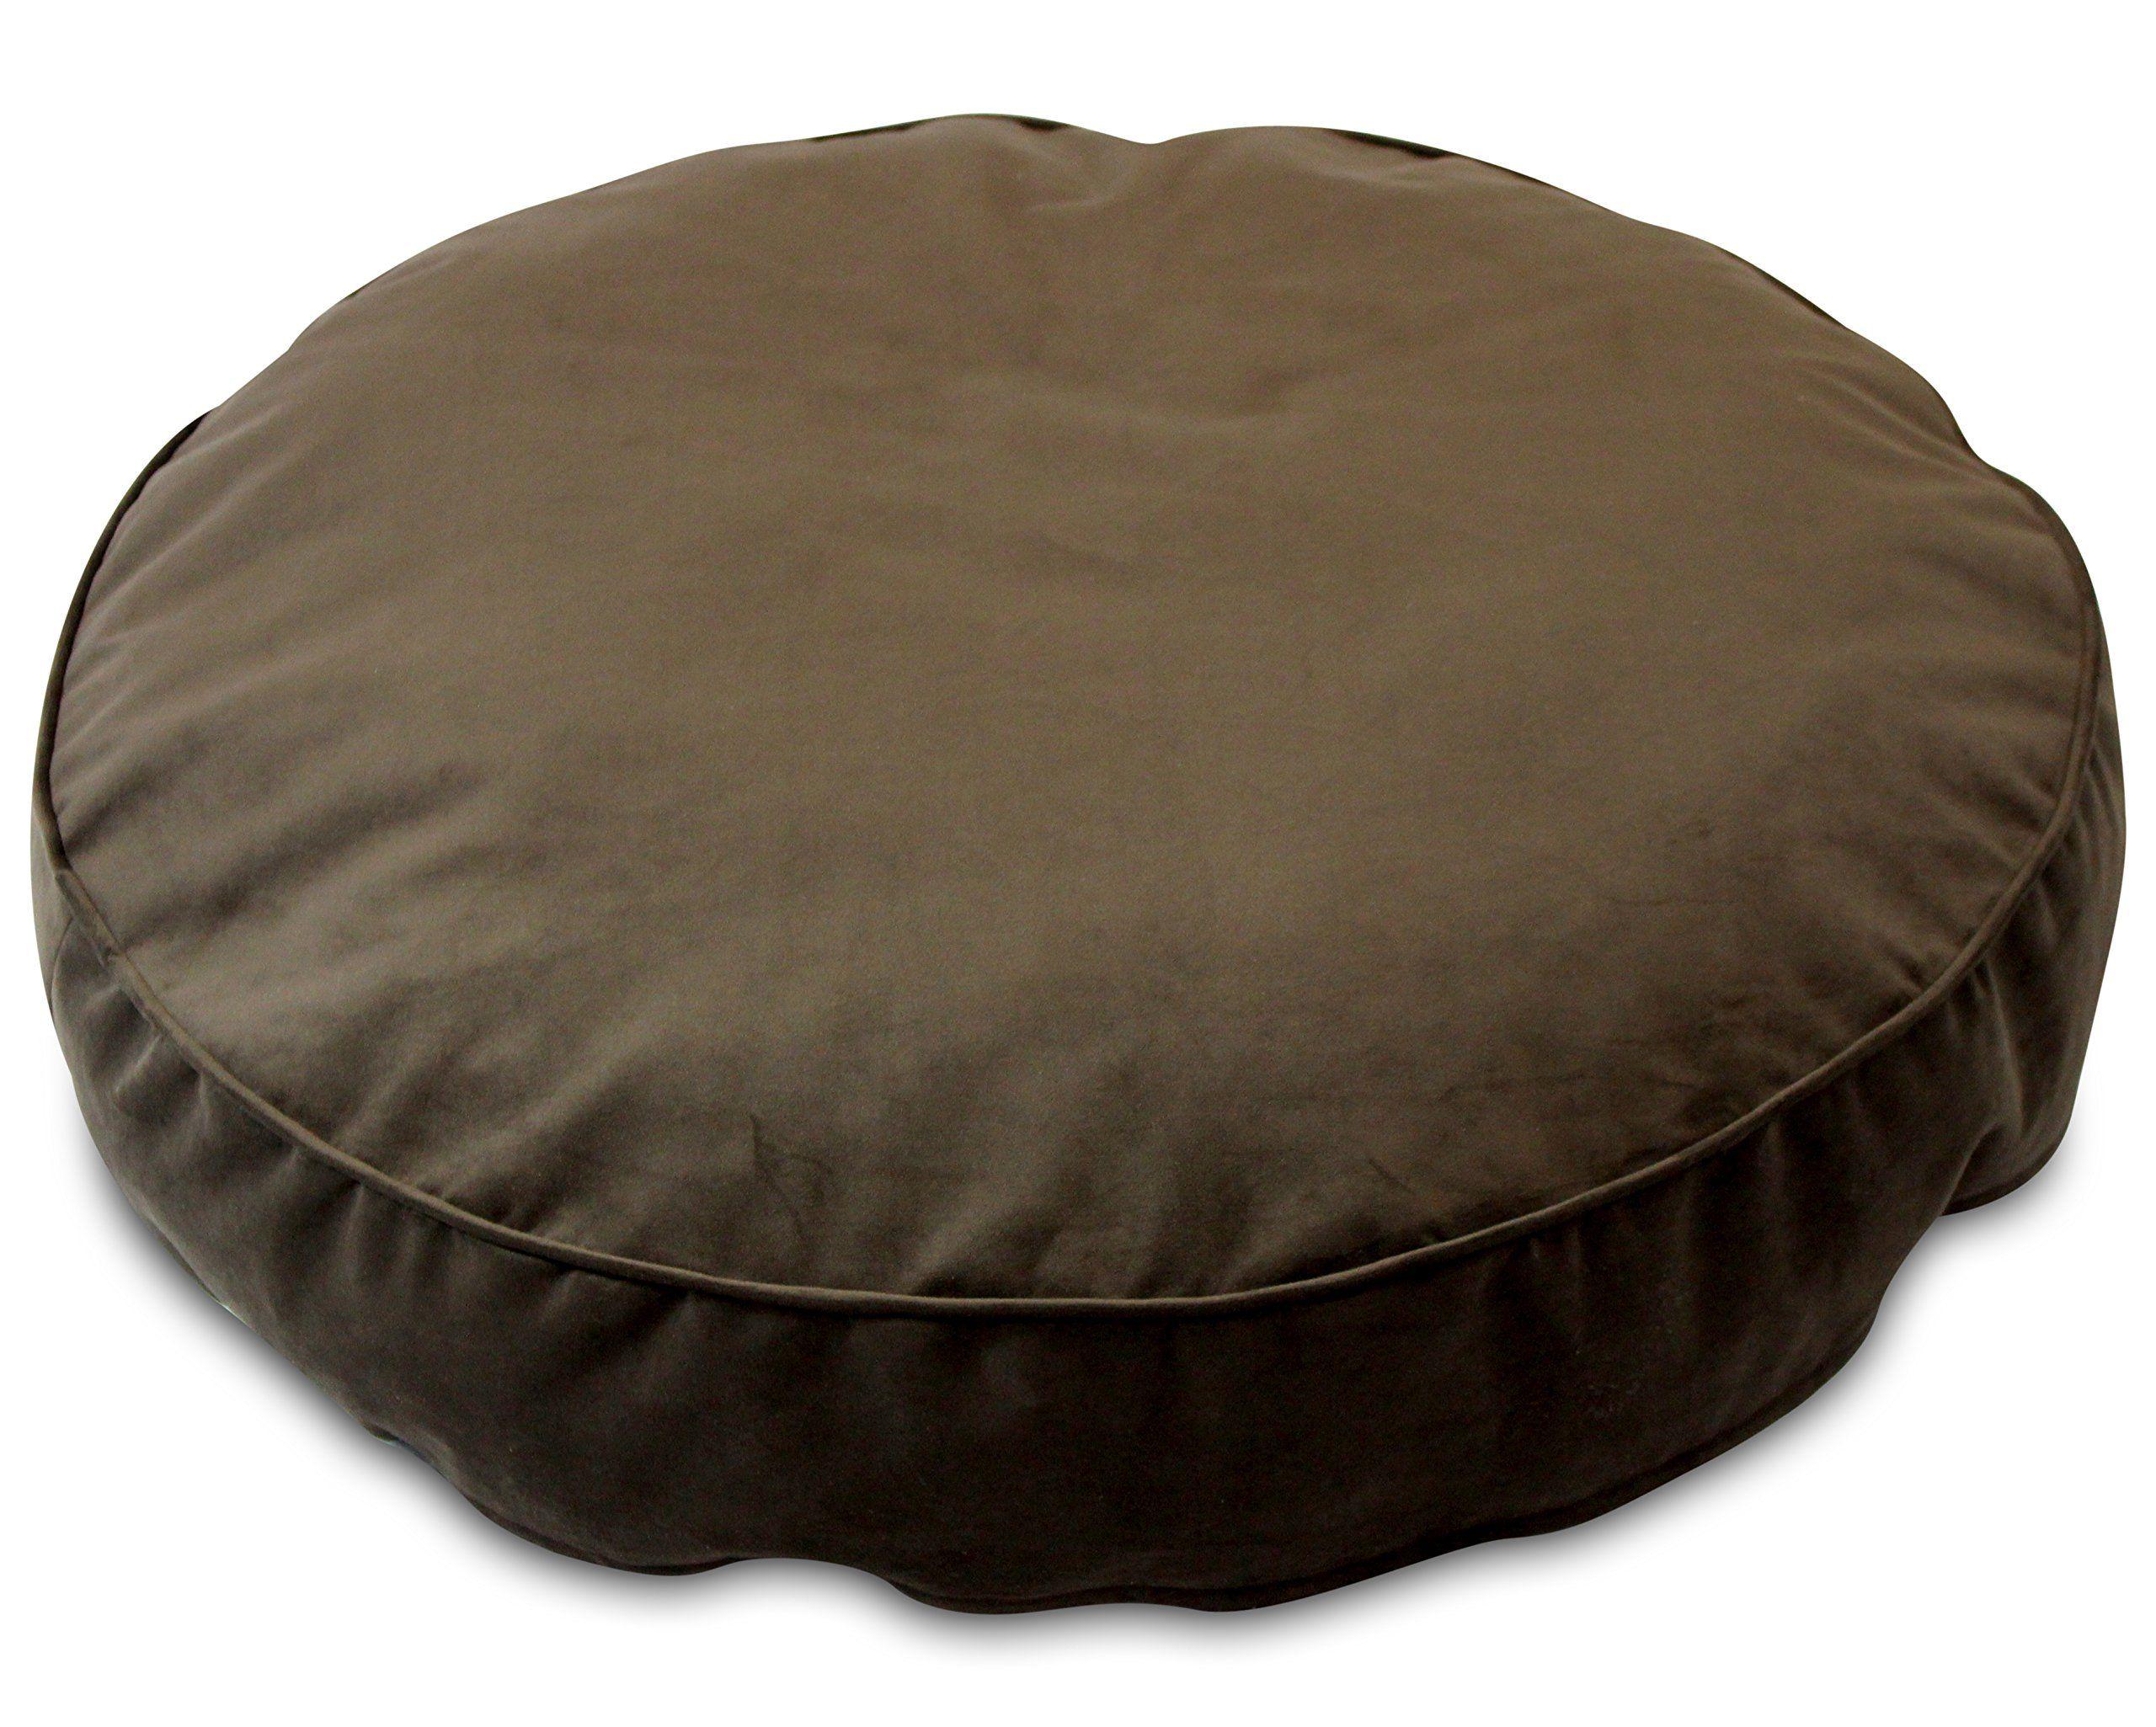 Oliver DogBedIdeas Dog bed, Round dog bed, Dog bed large